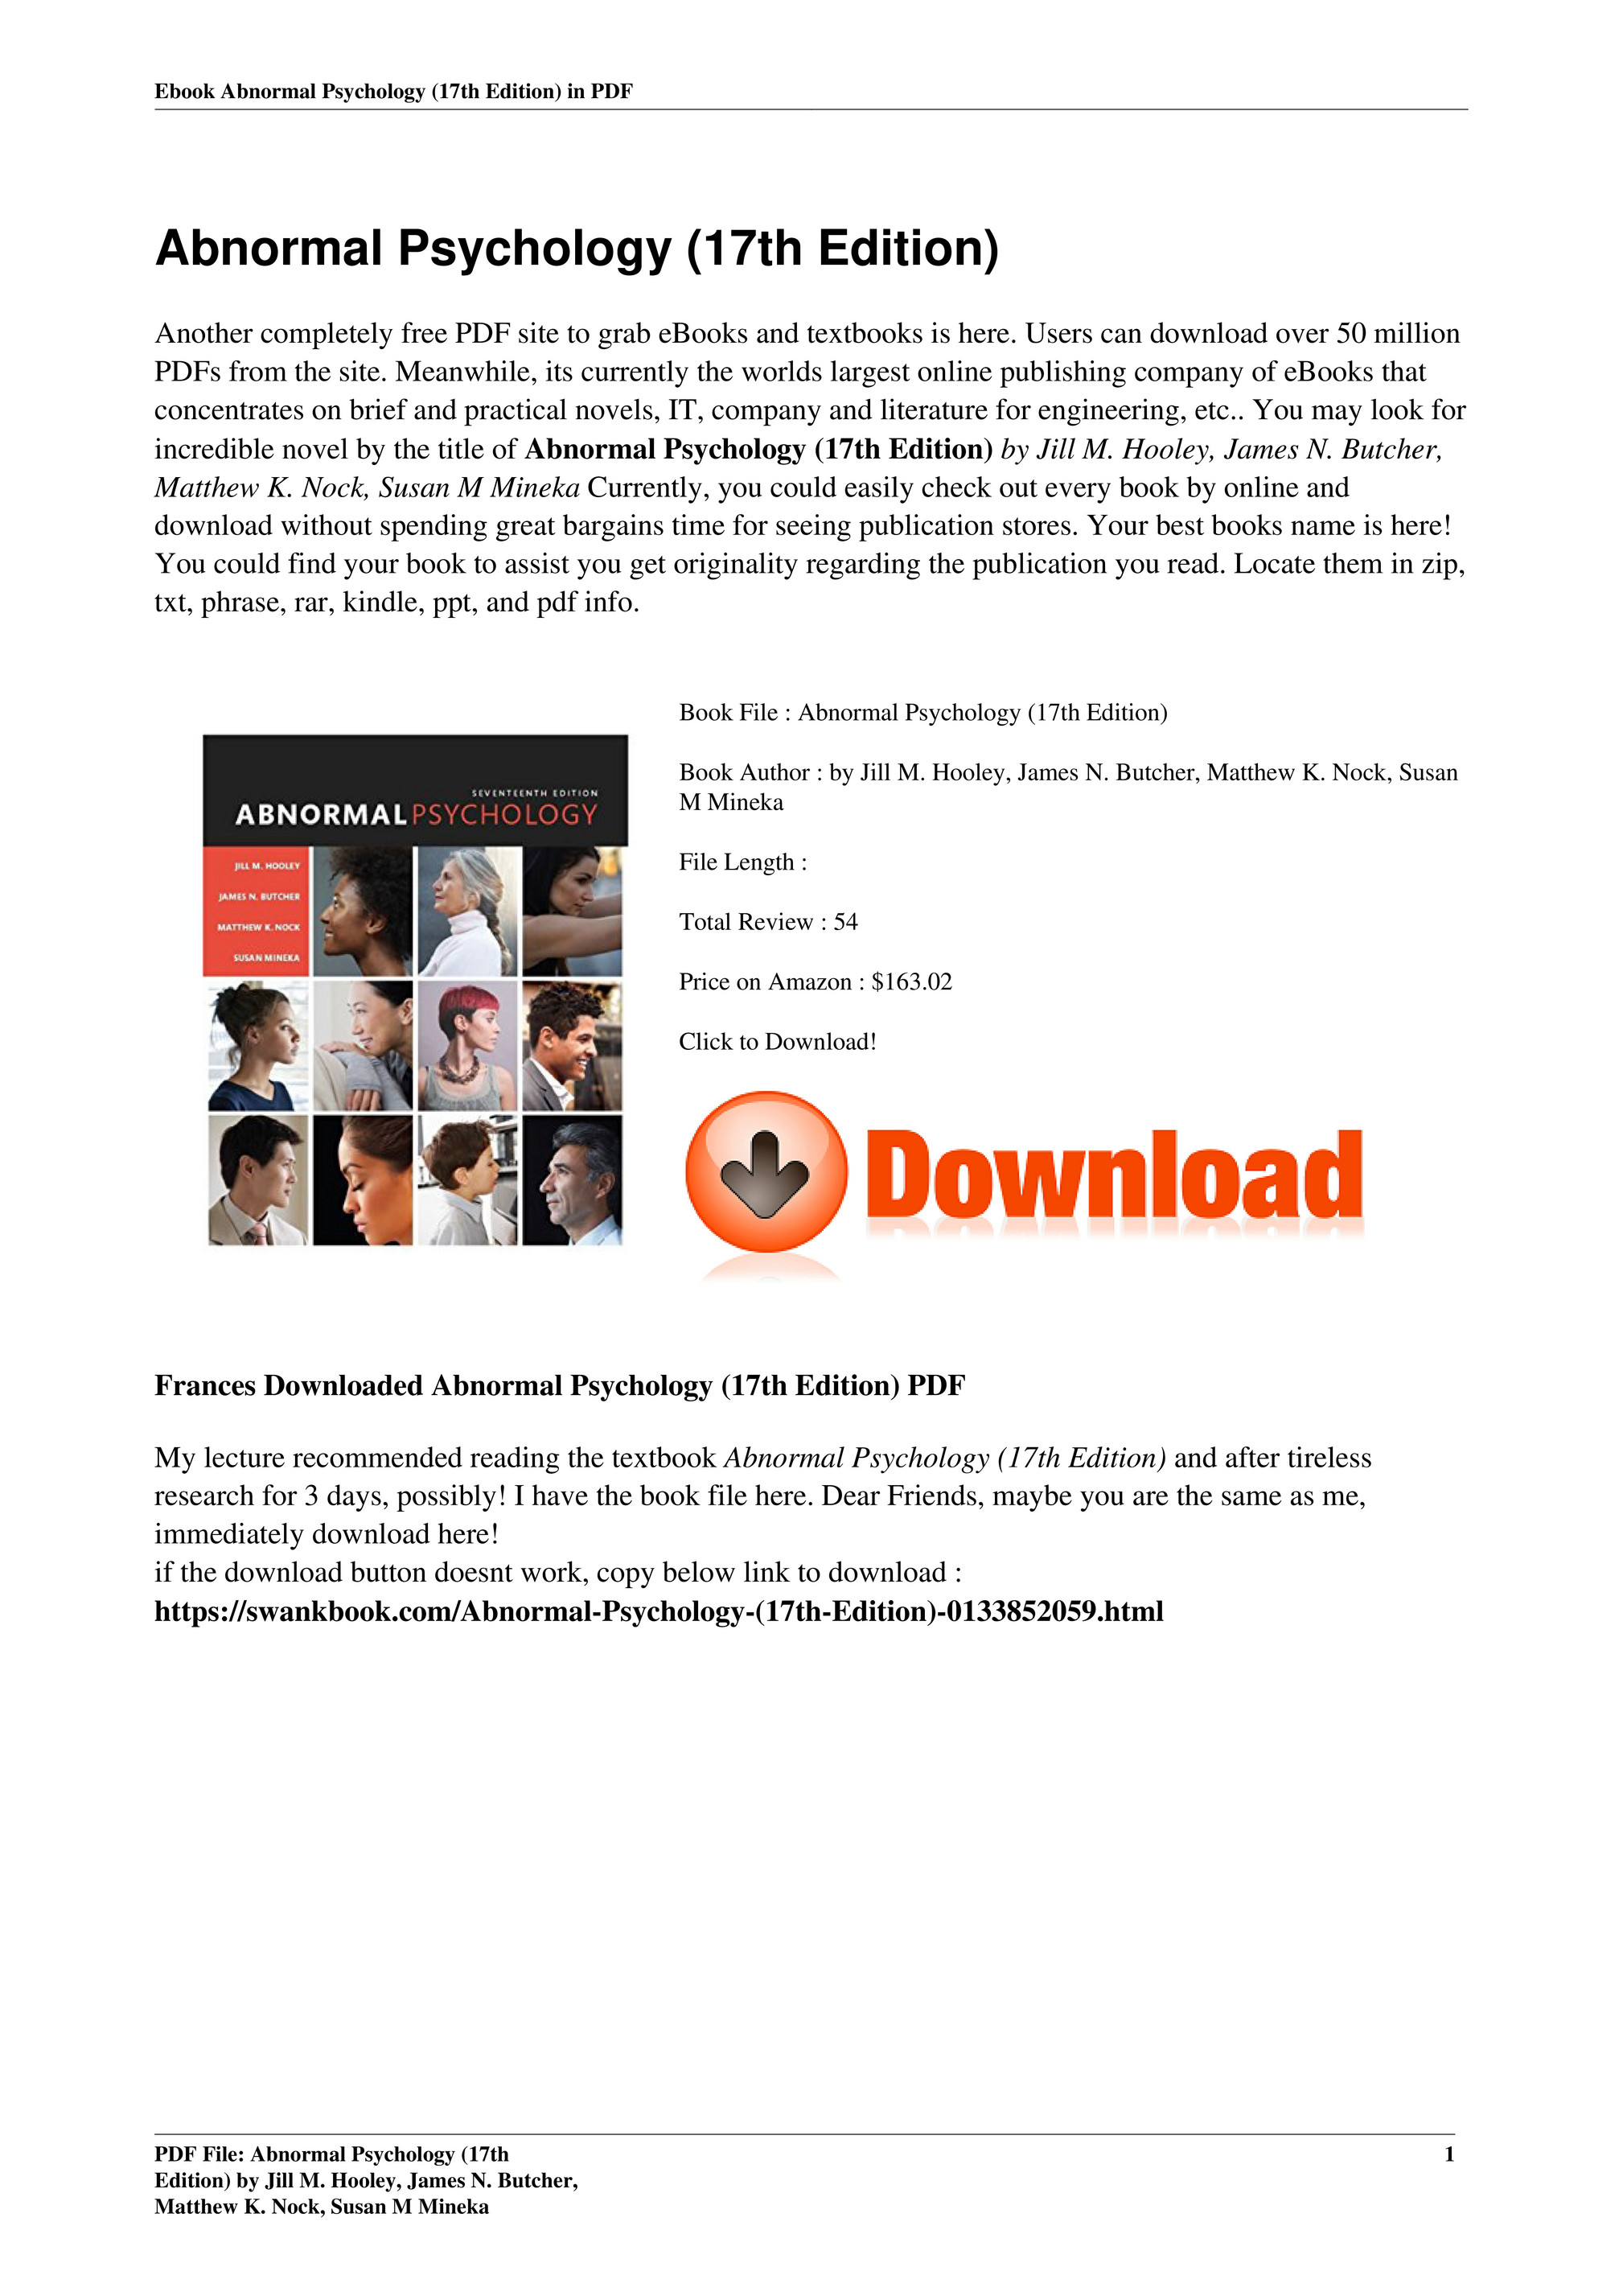 Abnormal Psychology 17th Edition Pdf Free